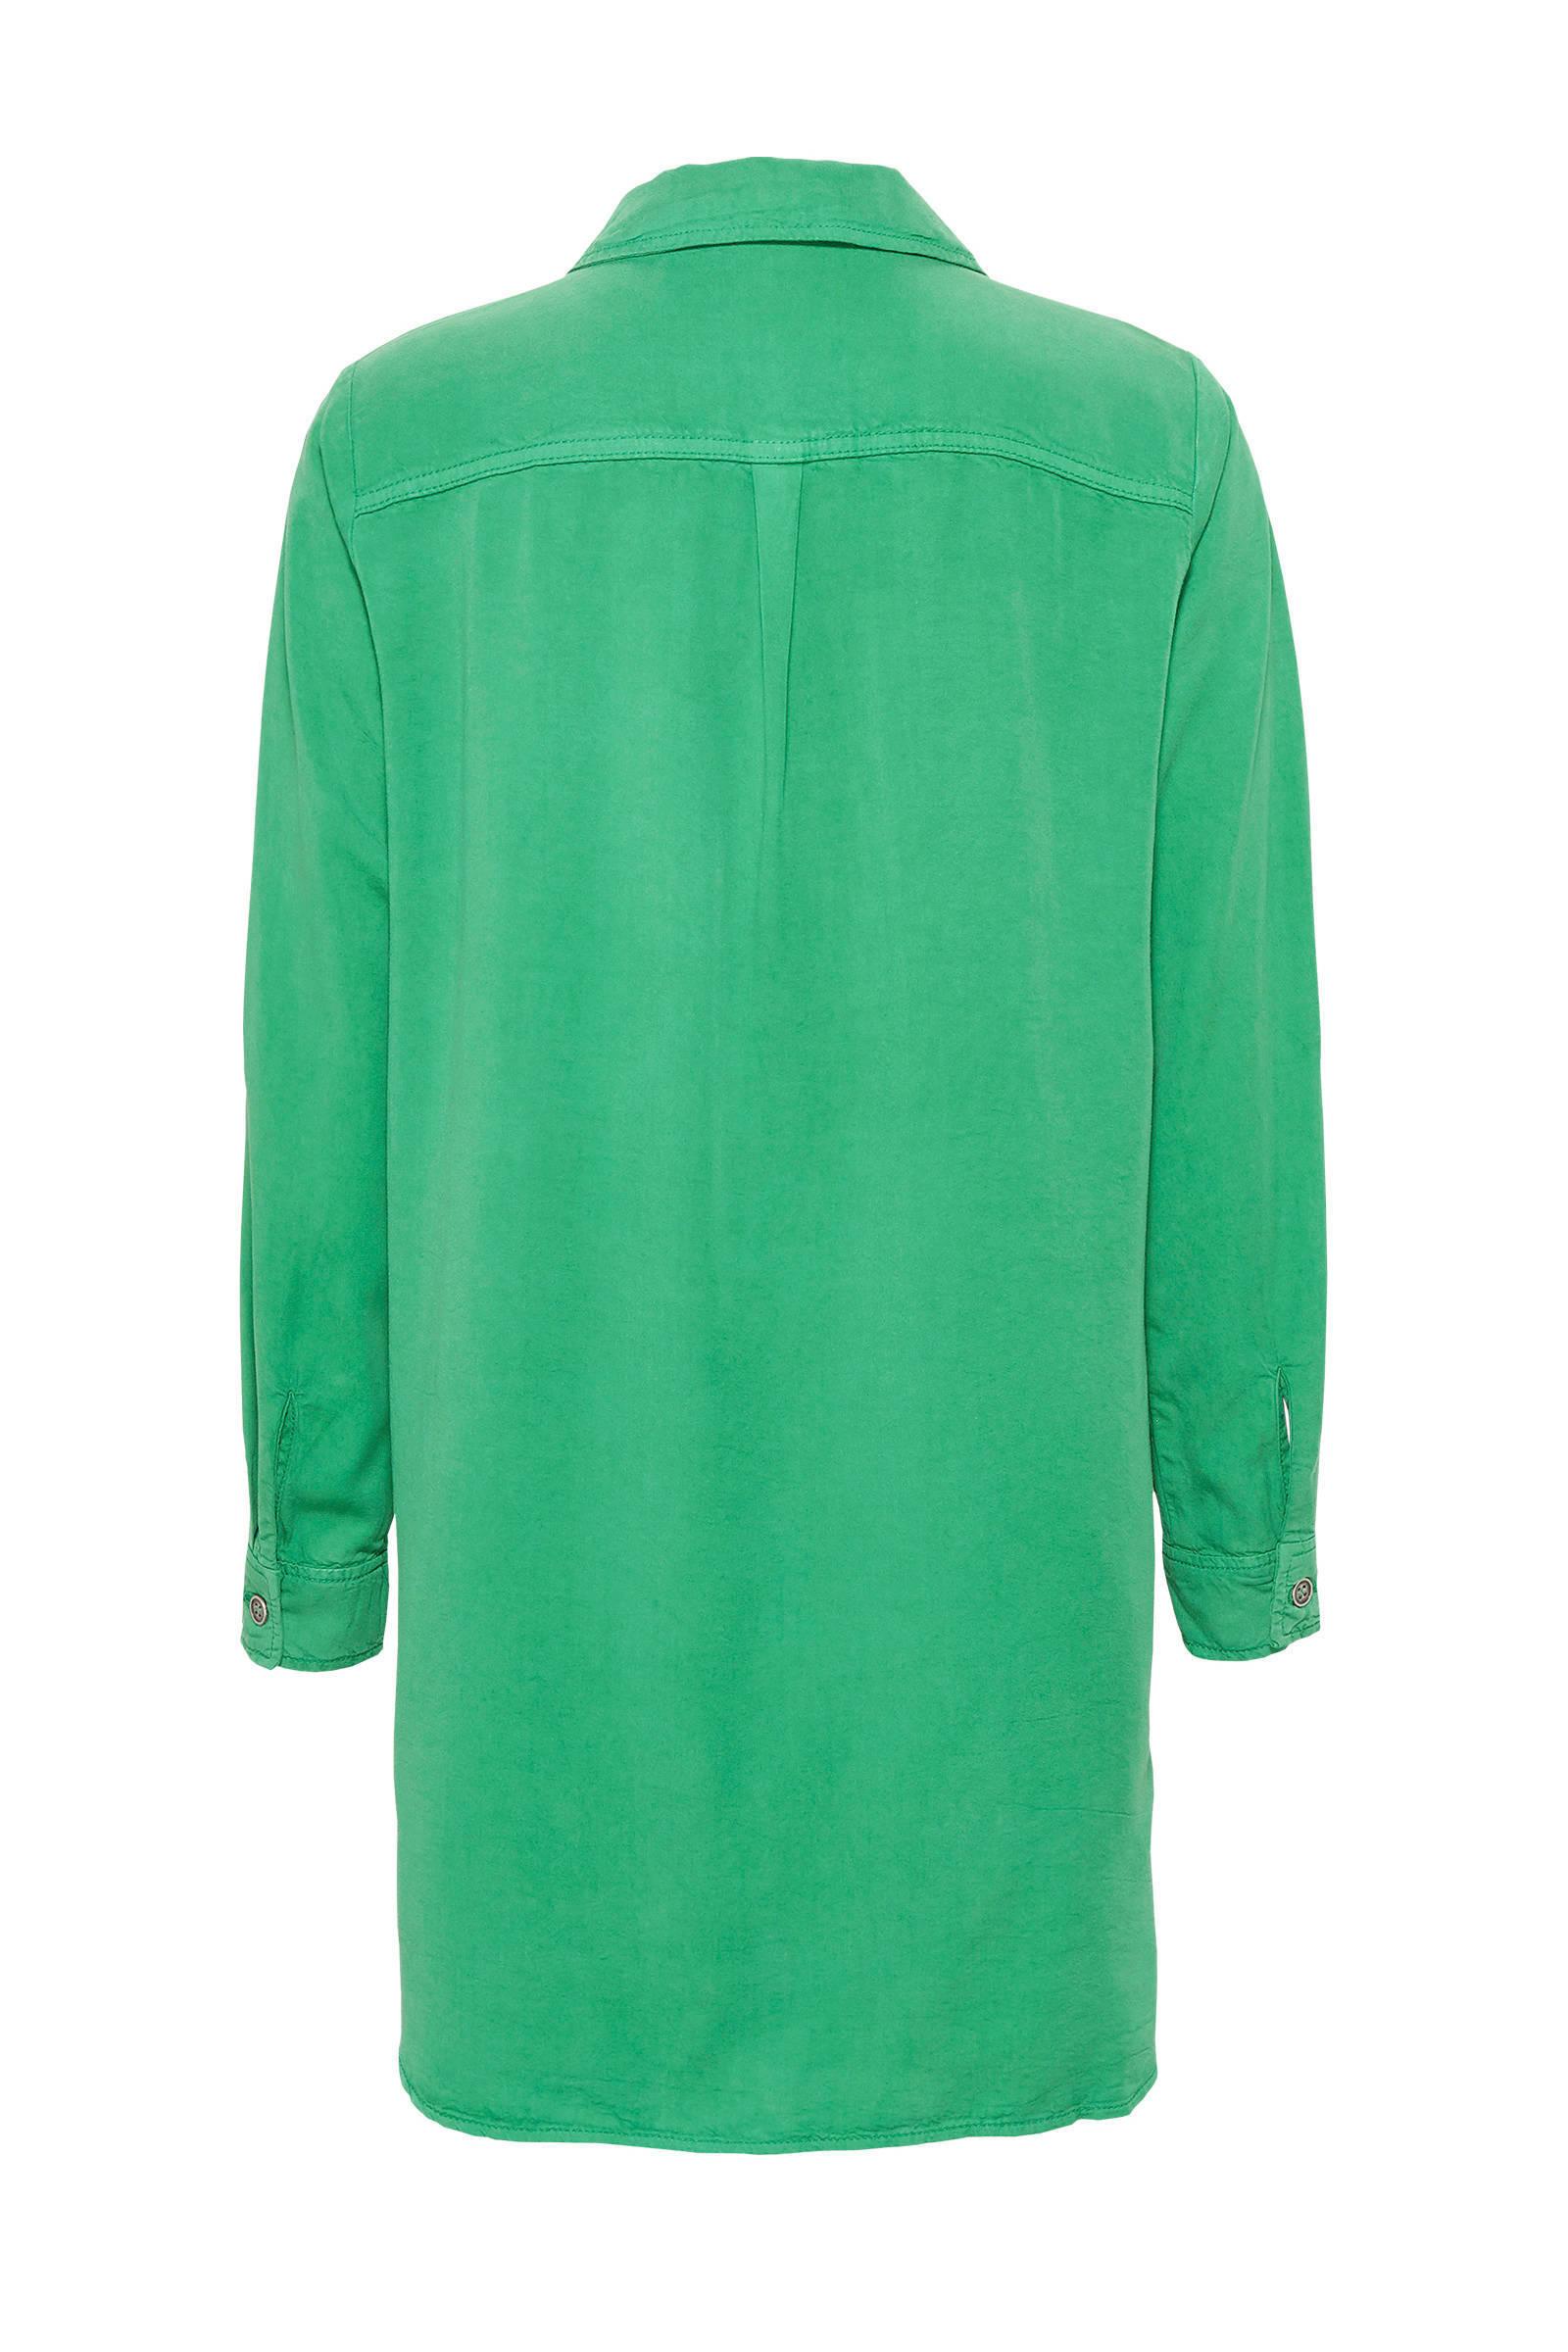 blouse blouse blouse groen Didi groen Didi Didi groen Didi blouse groen Didi qOEfw